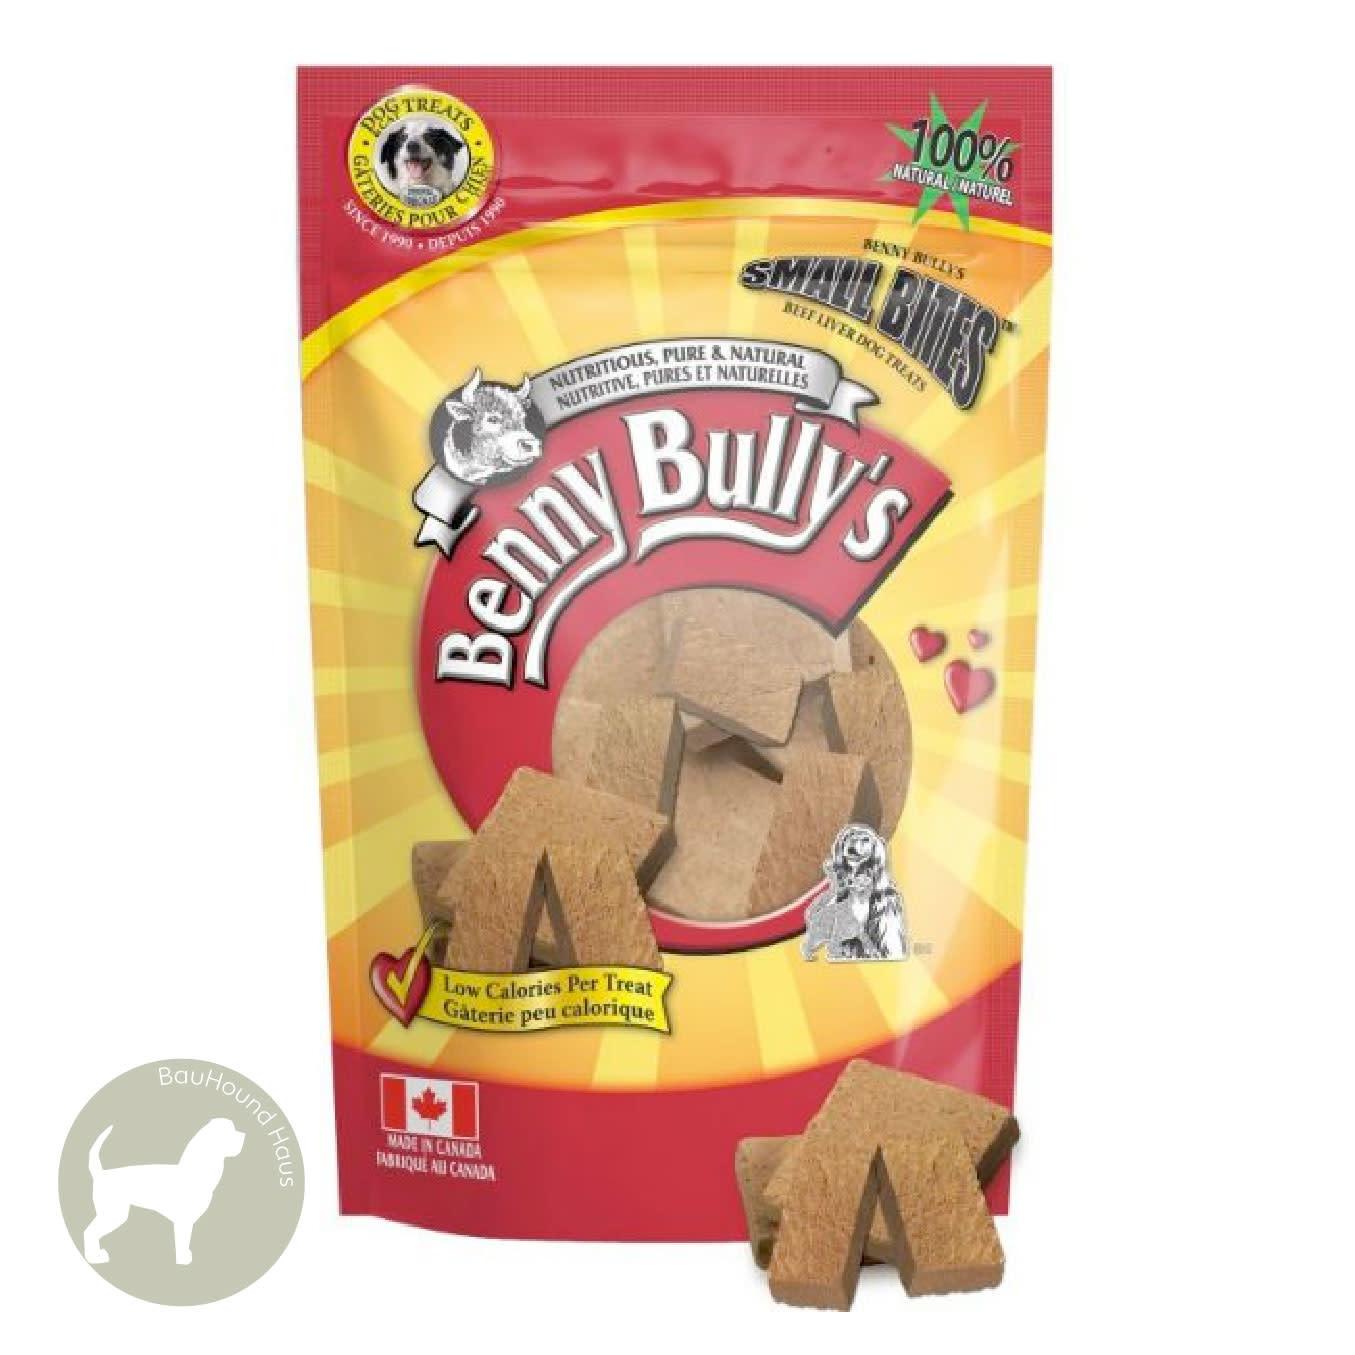 Benny Bully's Benny Bully's Small Bites Beef Liver Treats, 260g